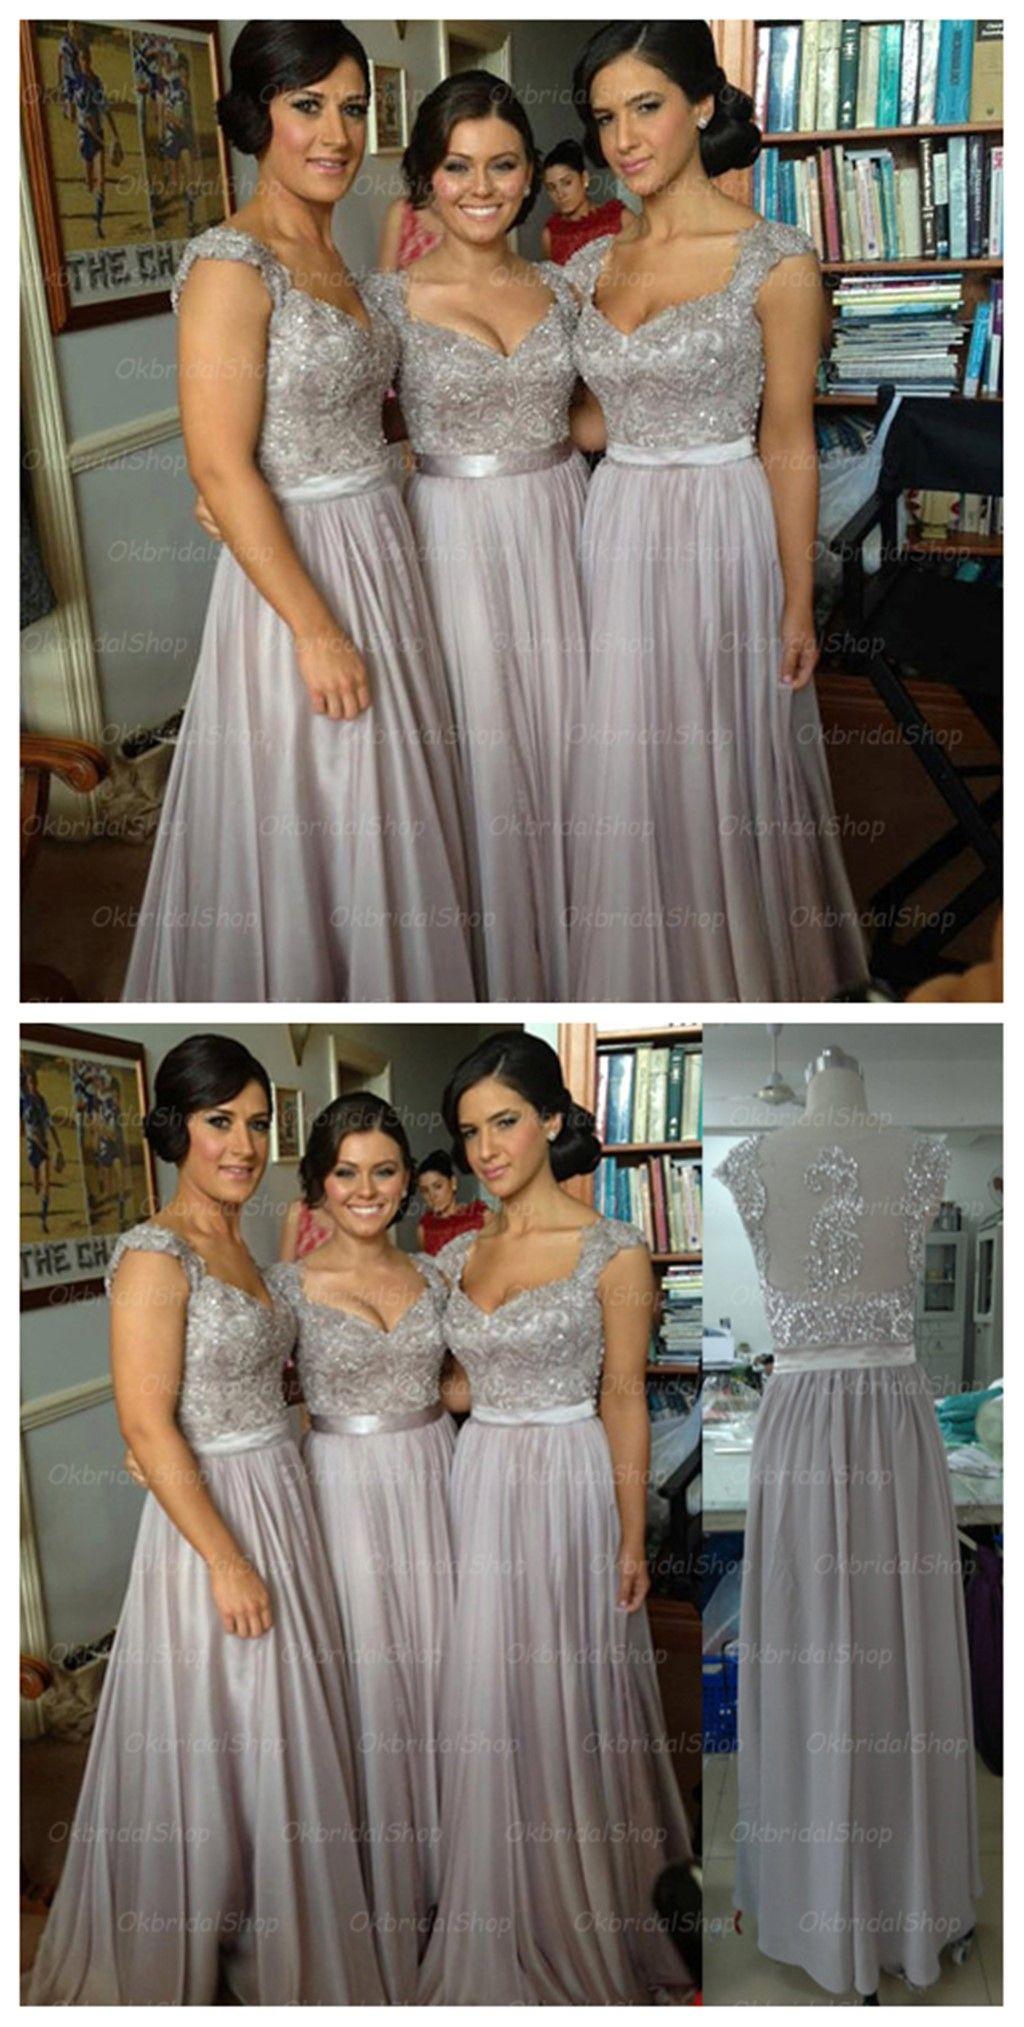 Lace dress gray  cap sleeve bridesmaid dresses lace bridesmaid dress grey prom